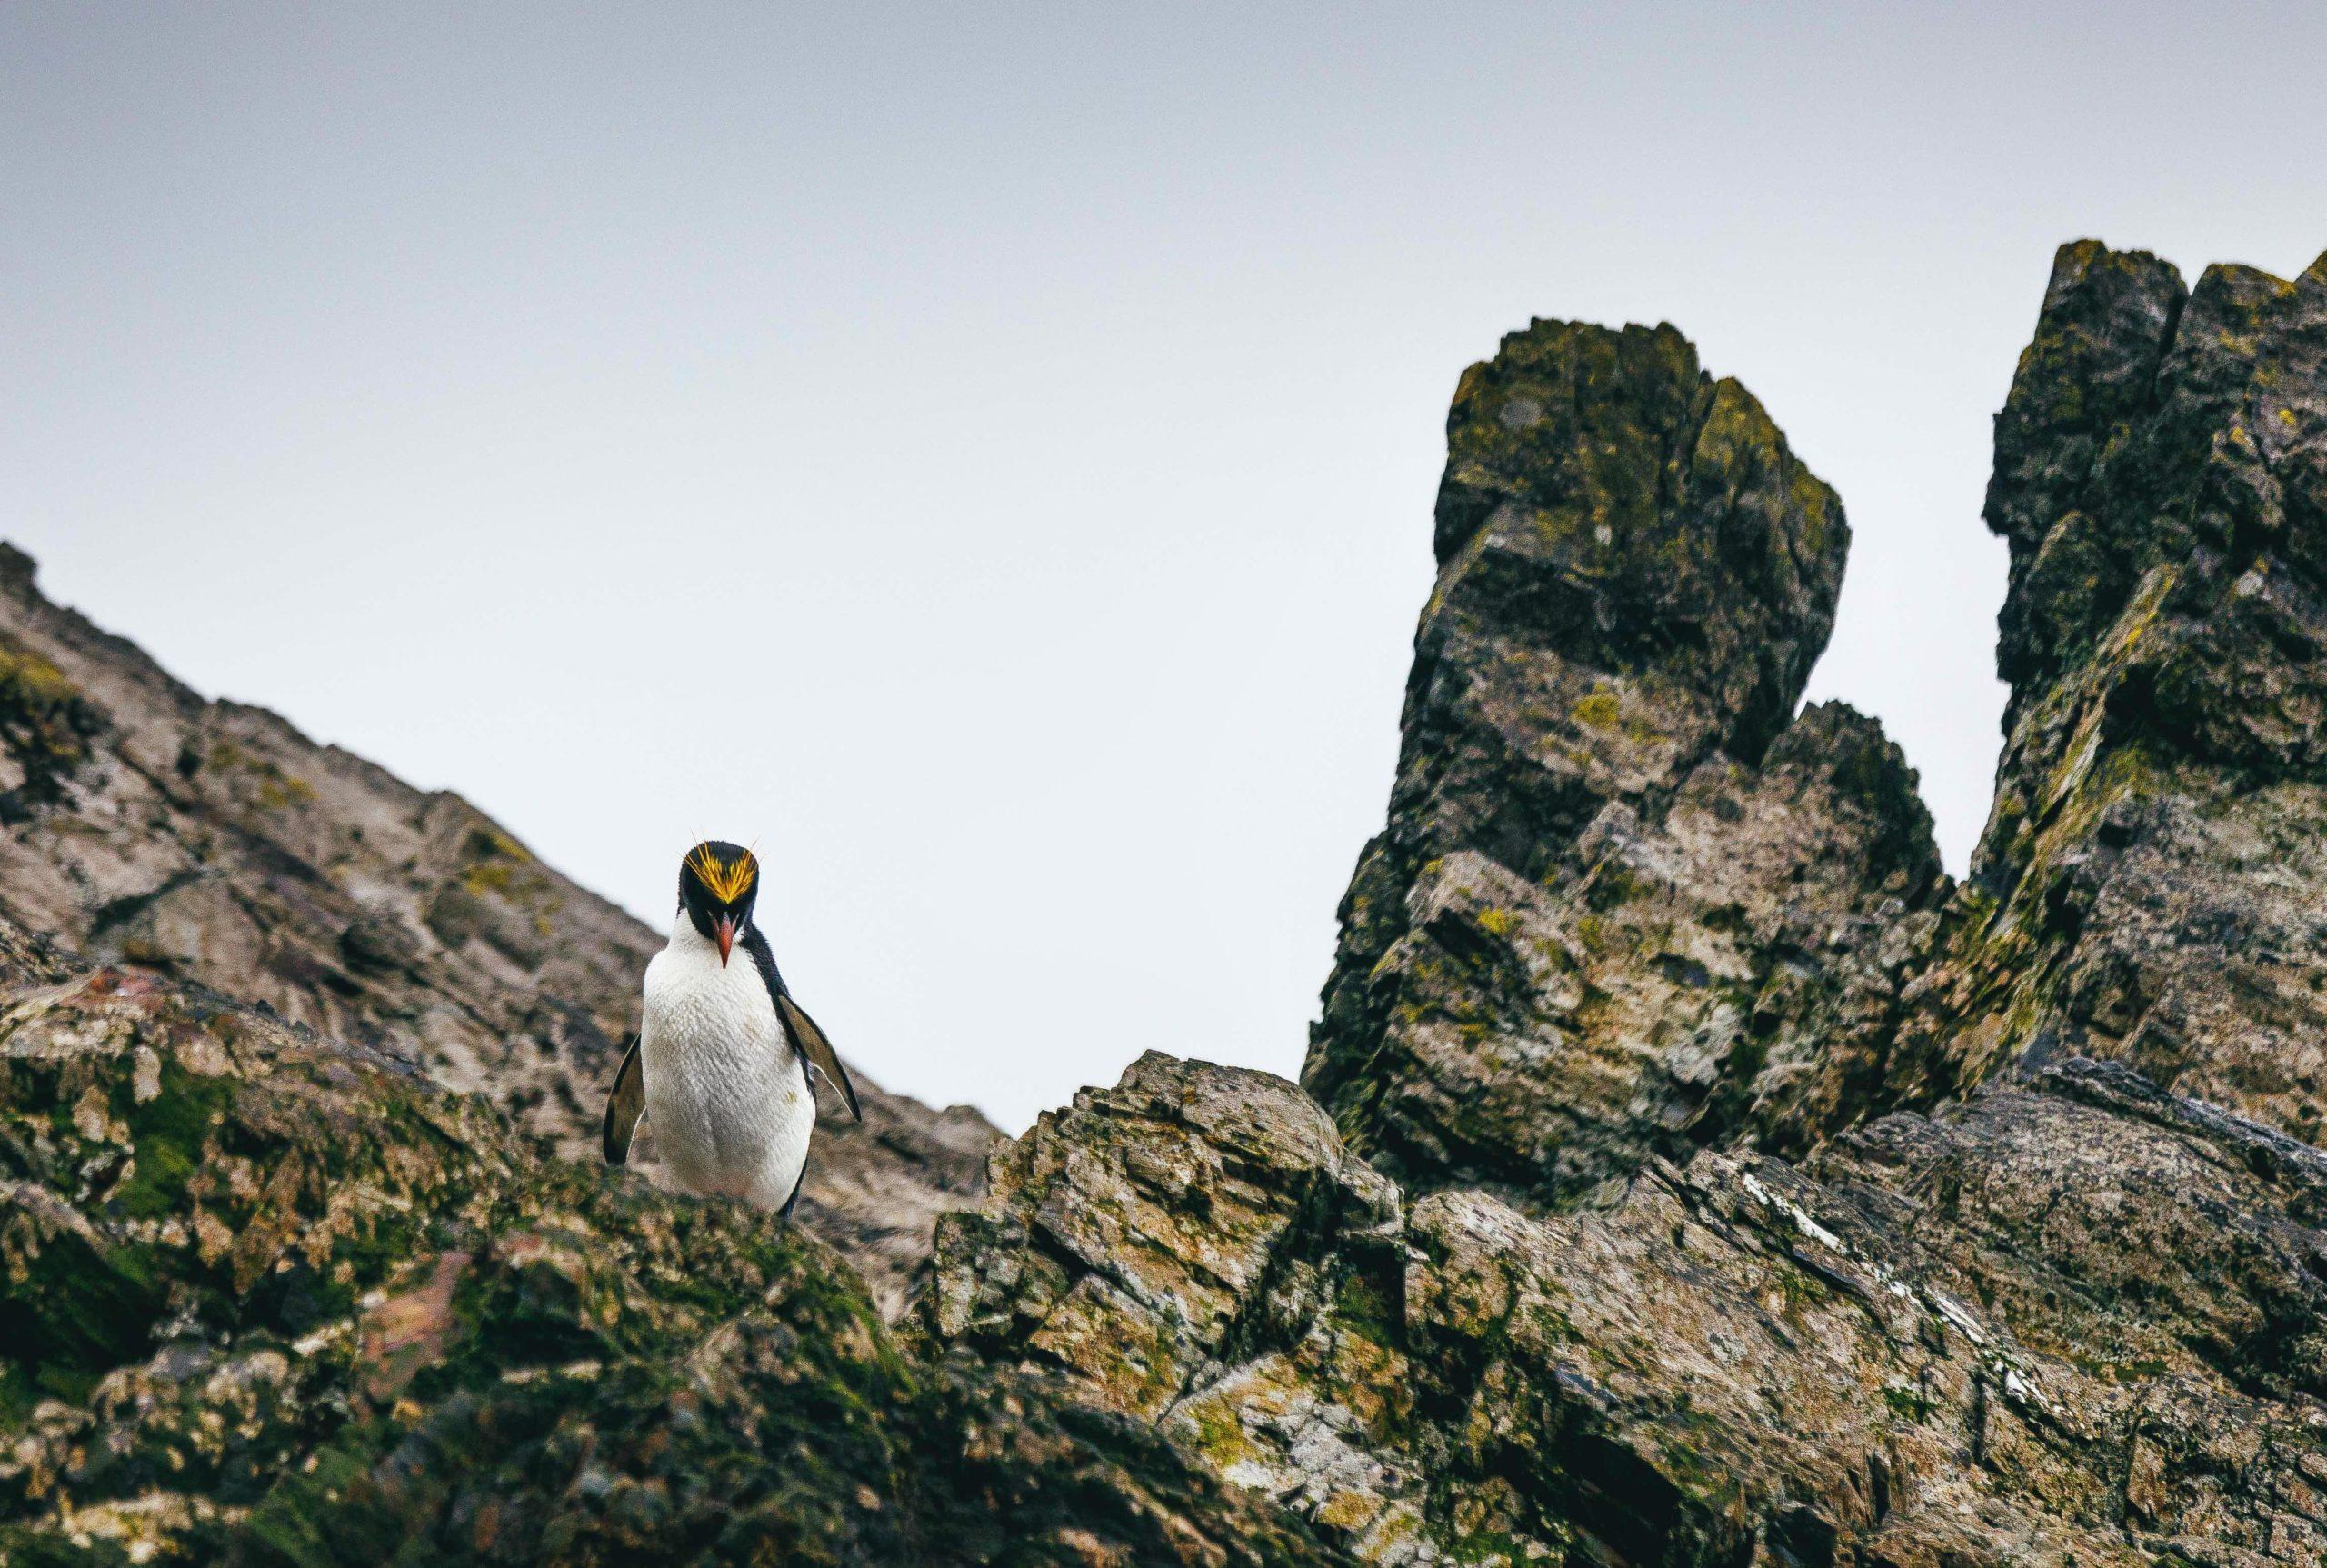 lone macaroni penguin walking across a rocky outcrop